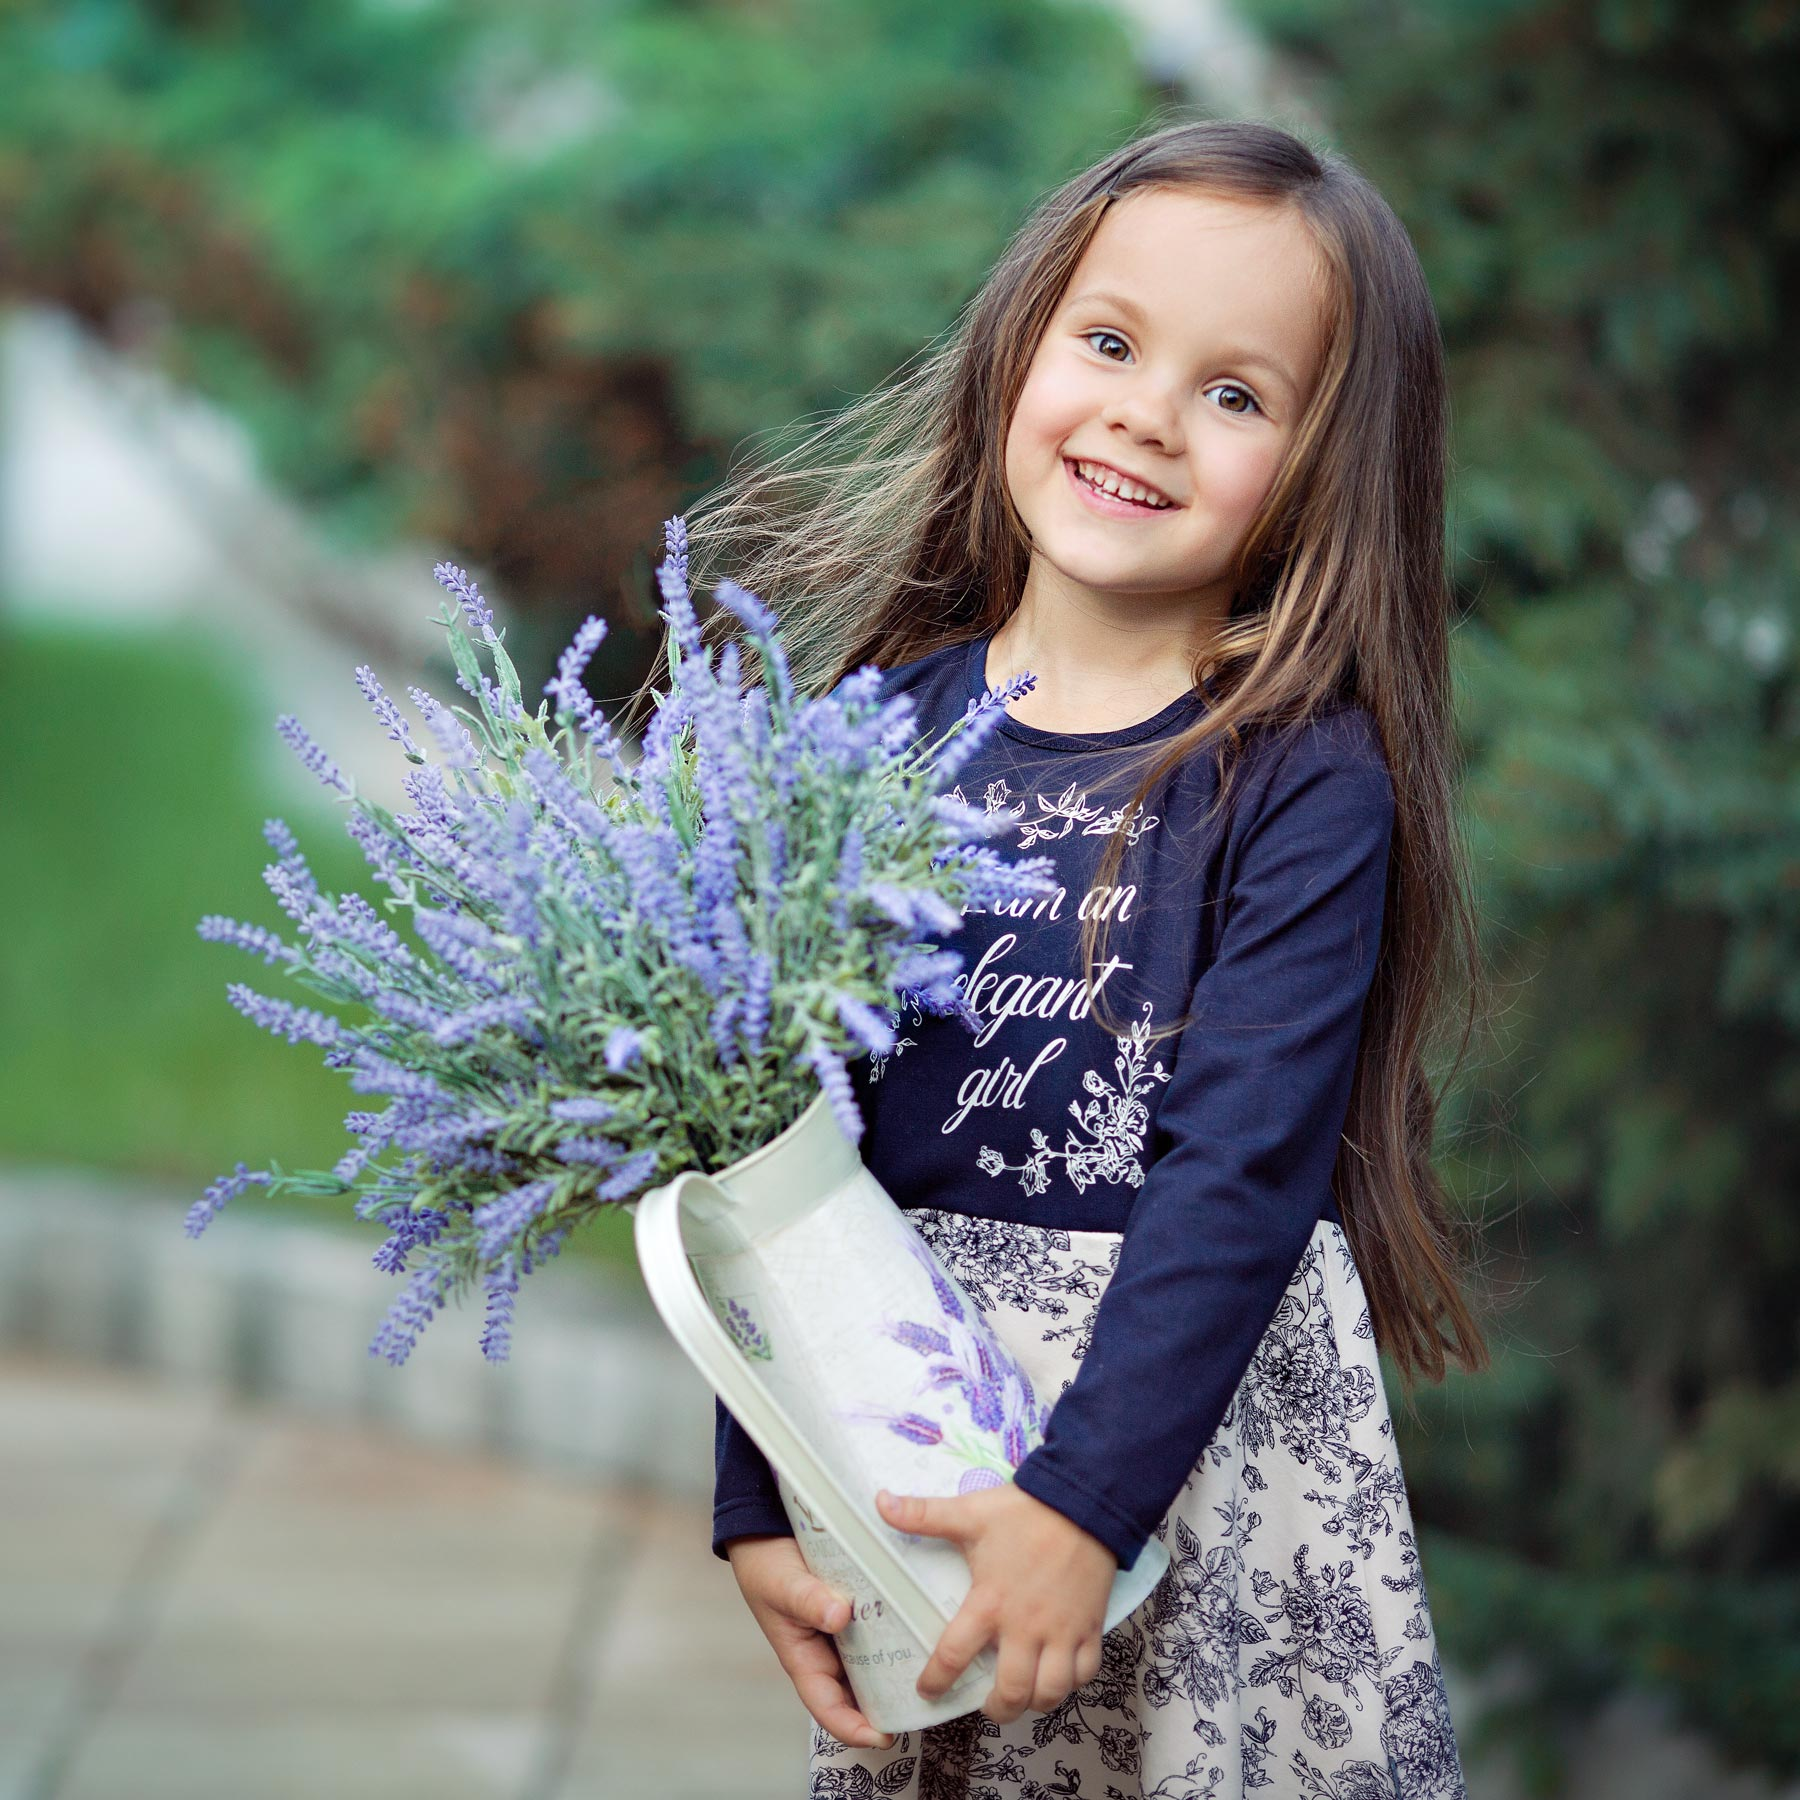 Available from 10.11 Children Girl's Blue&Purple Flower Dress BOSSA NOVA150B-167 2018 new high quality bridal flower girl dress party evening kids girls lace flower bow ball gown prom princess tutu dress 5 16y